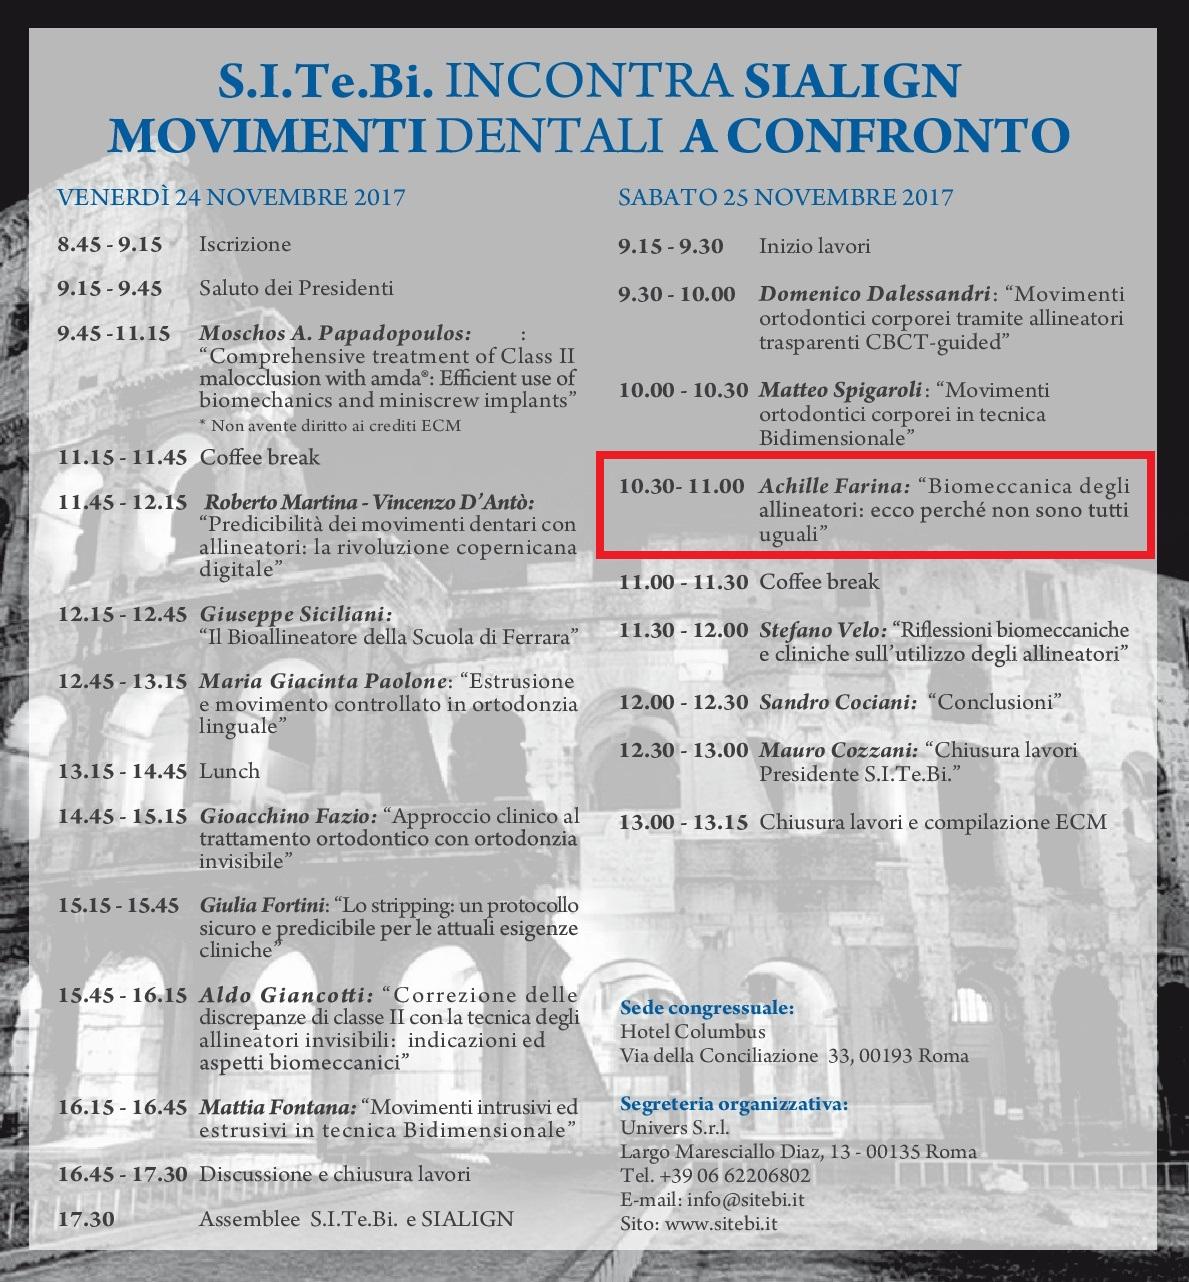 Programma-Sitebi-incontra-Sialign_digitale-002